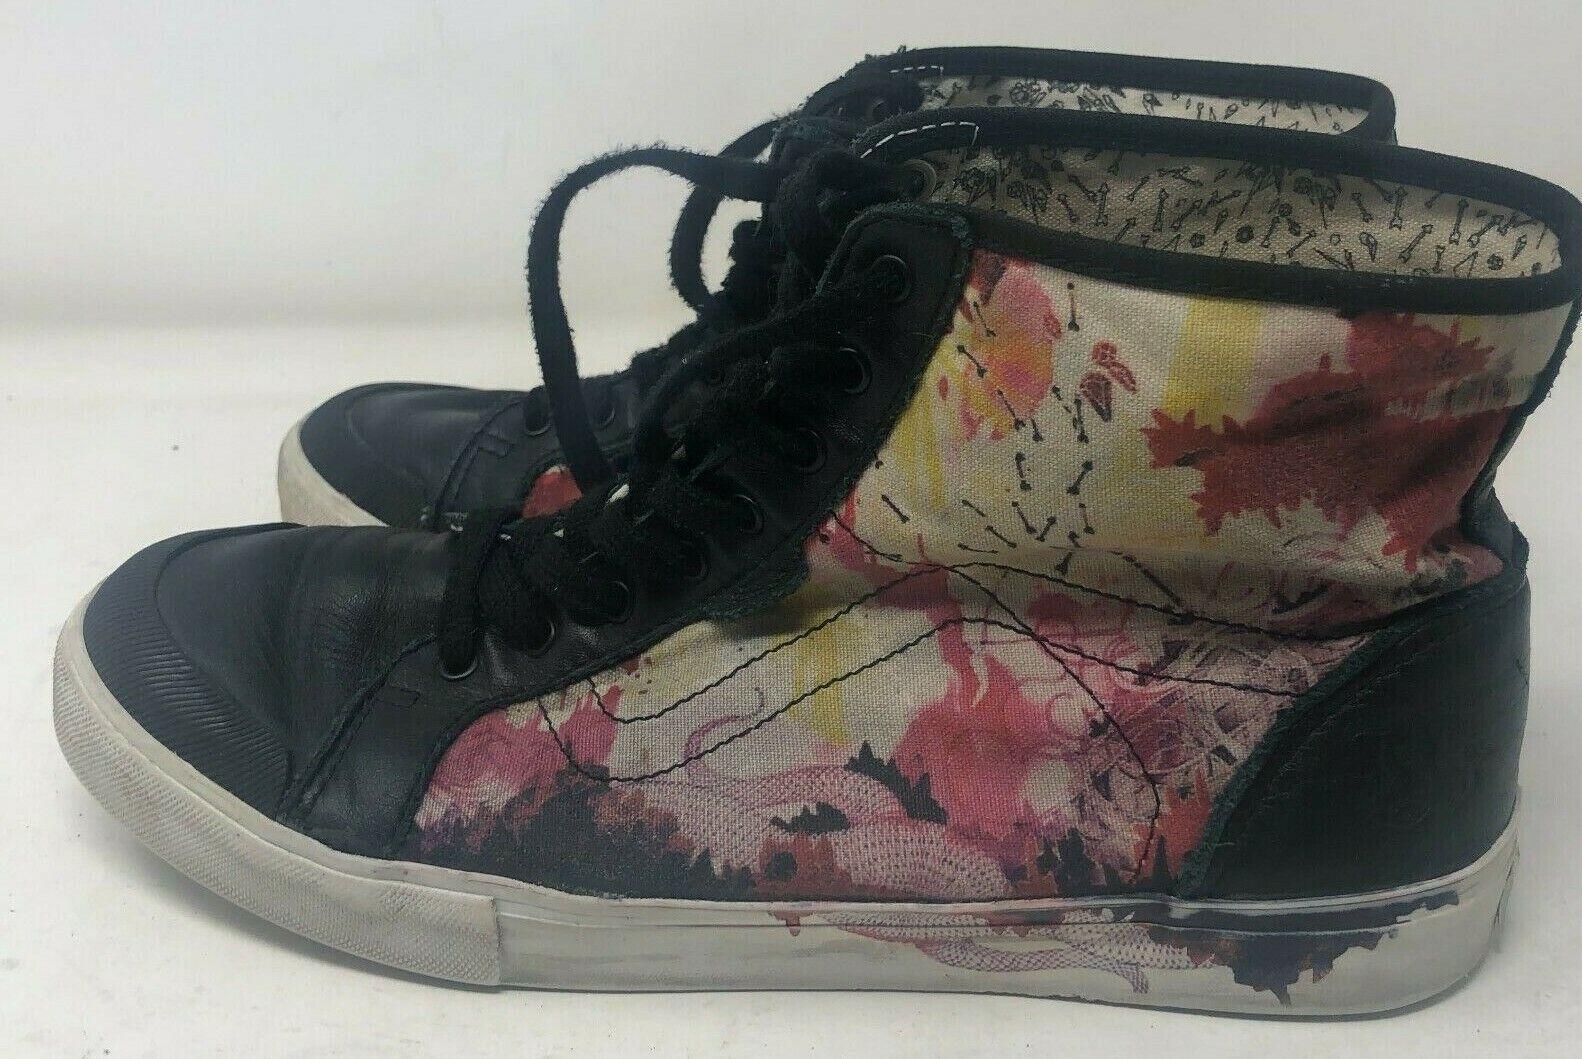 2010 Hannah Stouffer X Vans wellesey obsessionnel de combustion pour femme chaussures rares